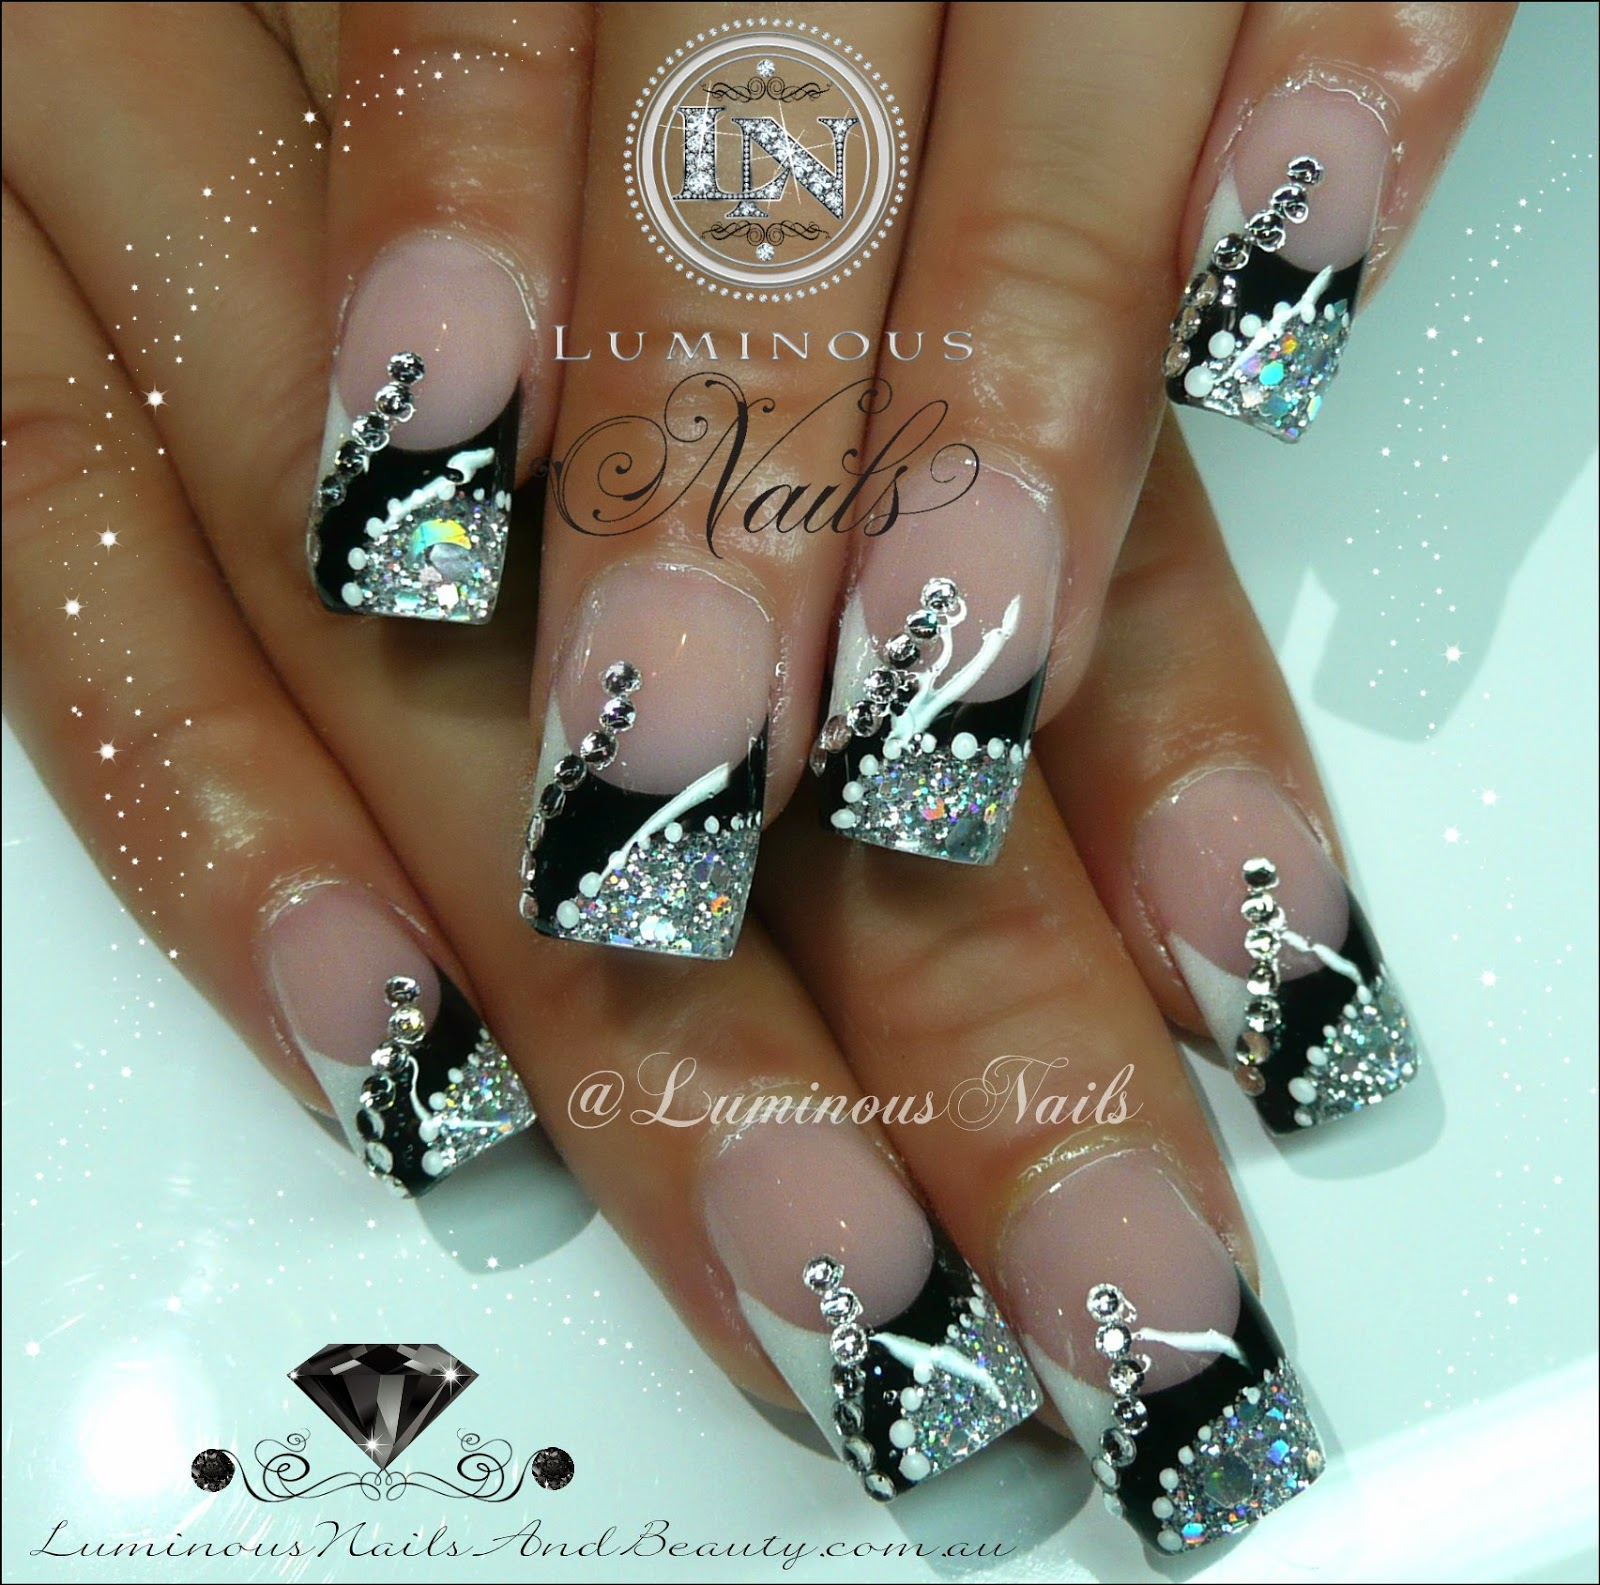 Luminous Nails: April 2014